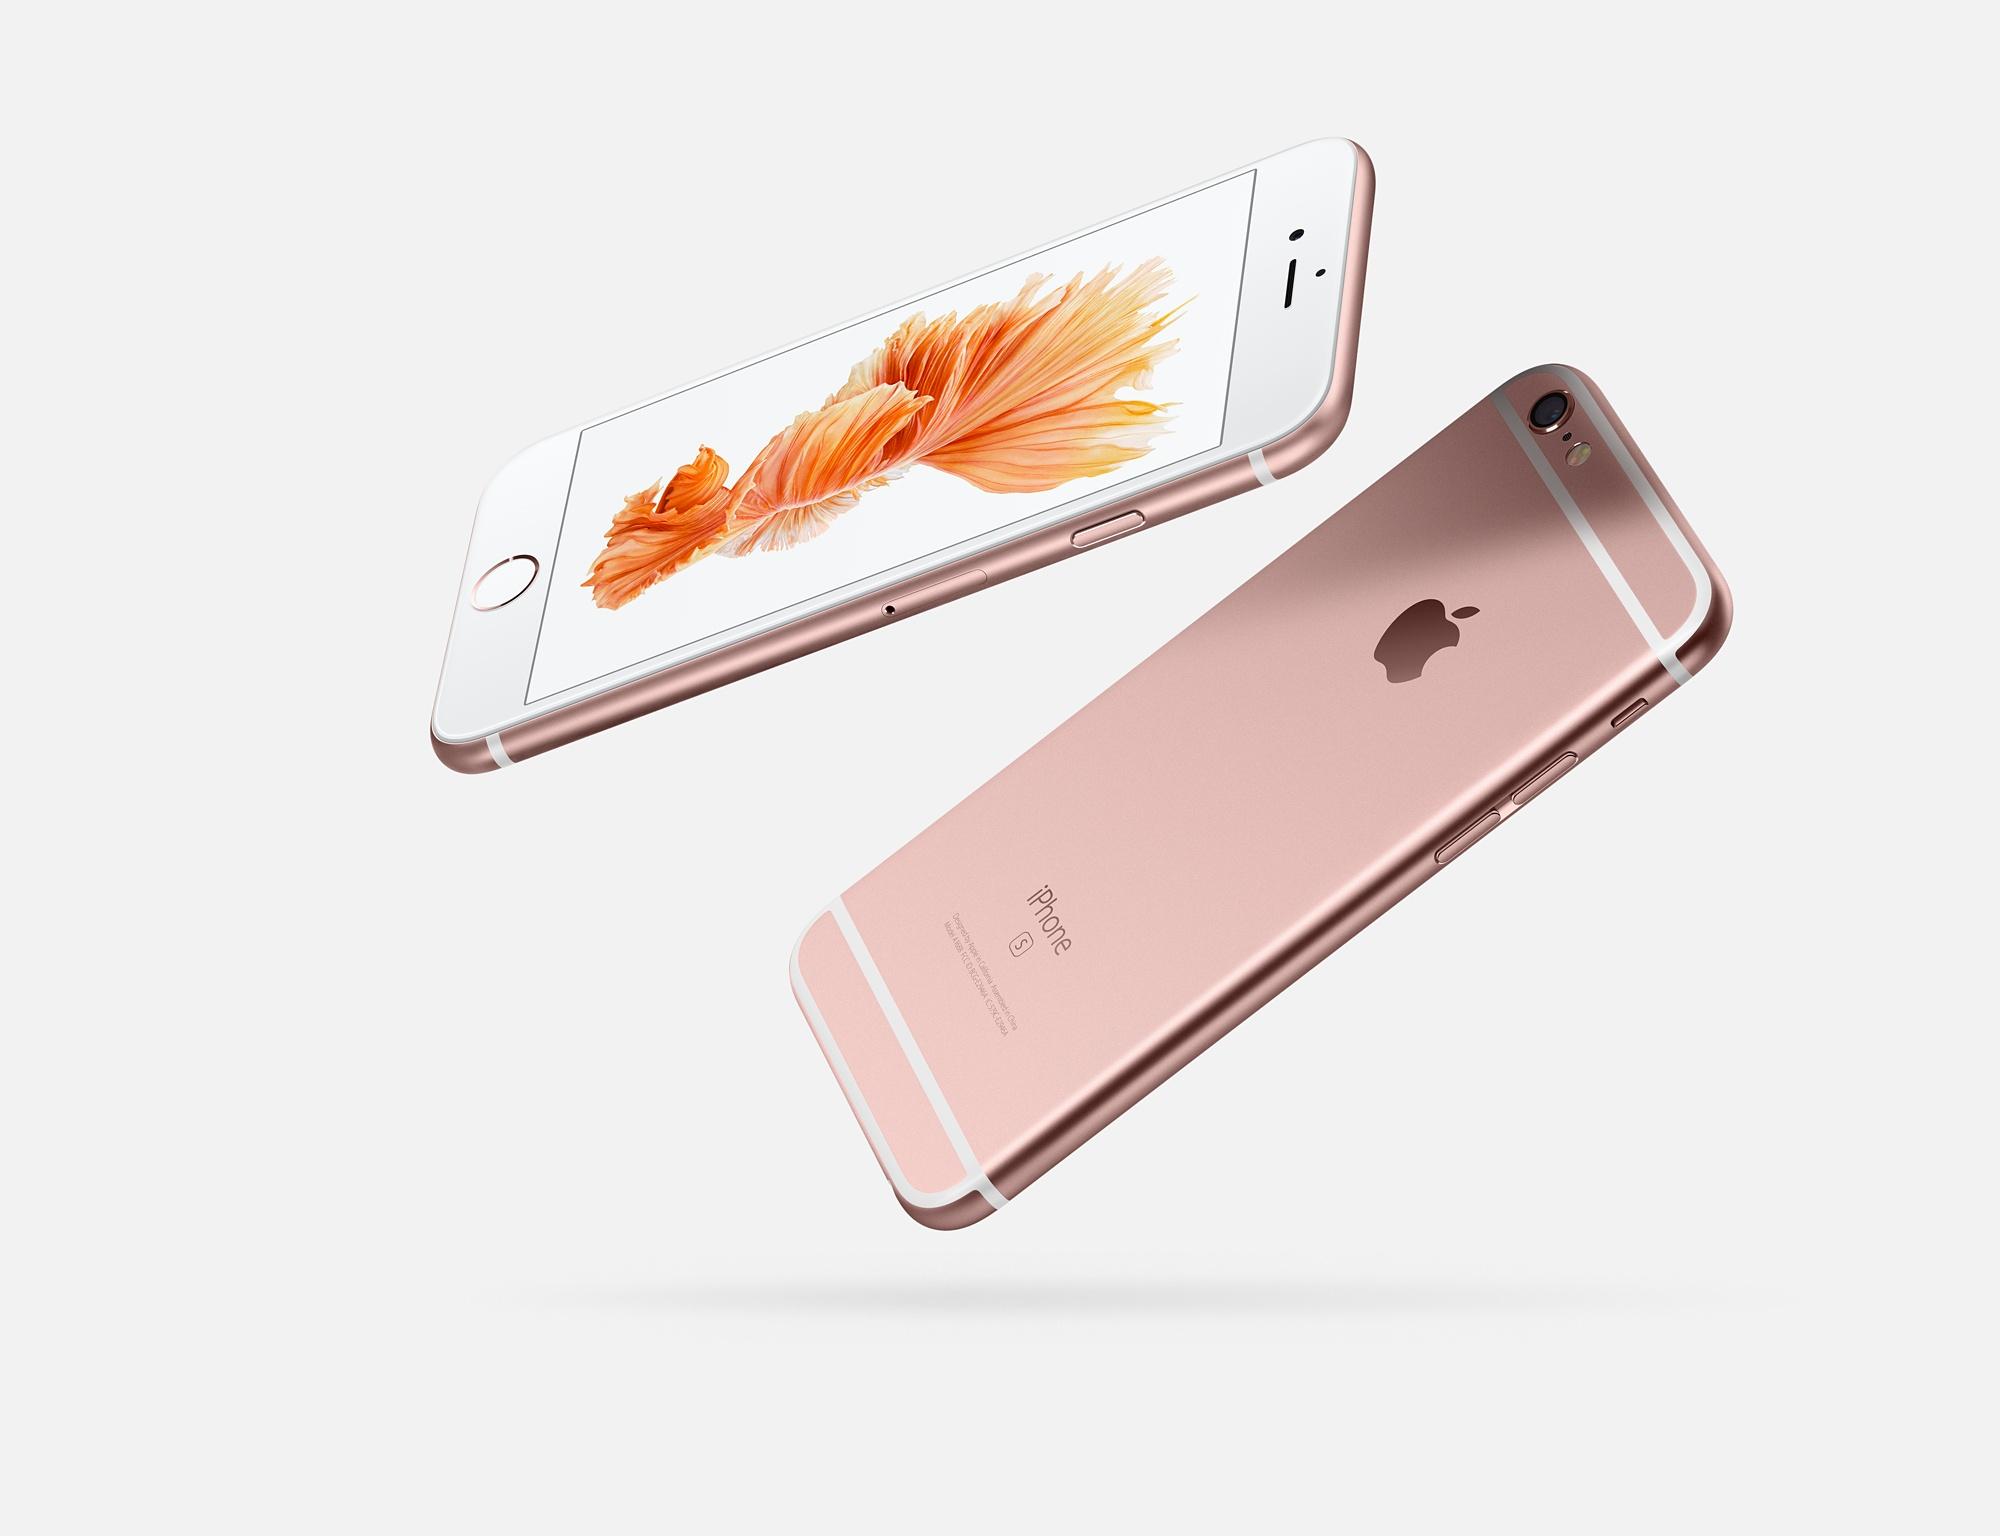 Appleが旧製品の速度の意図的な低下で謝罪&バッテリー交換費用を79ドルから29ドルに値下げ。2018年1月以降~。